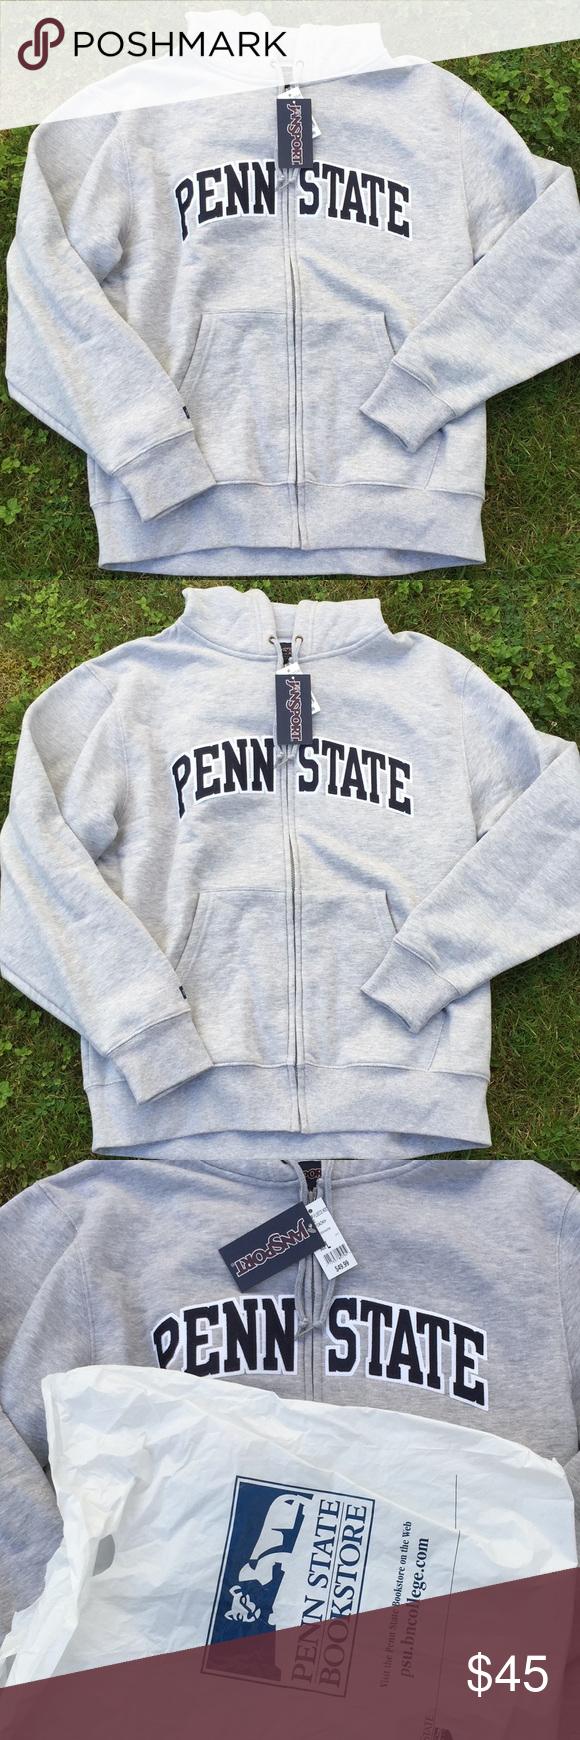 Penn State Men S Hoodie Nwt Size L Sweatshirt Shirt Clothes Design Hoodies [ 1740 x 580 Pixel ]